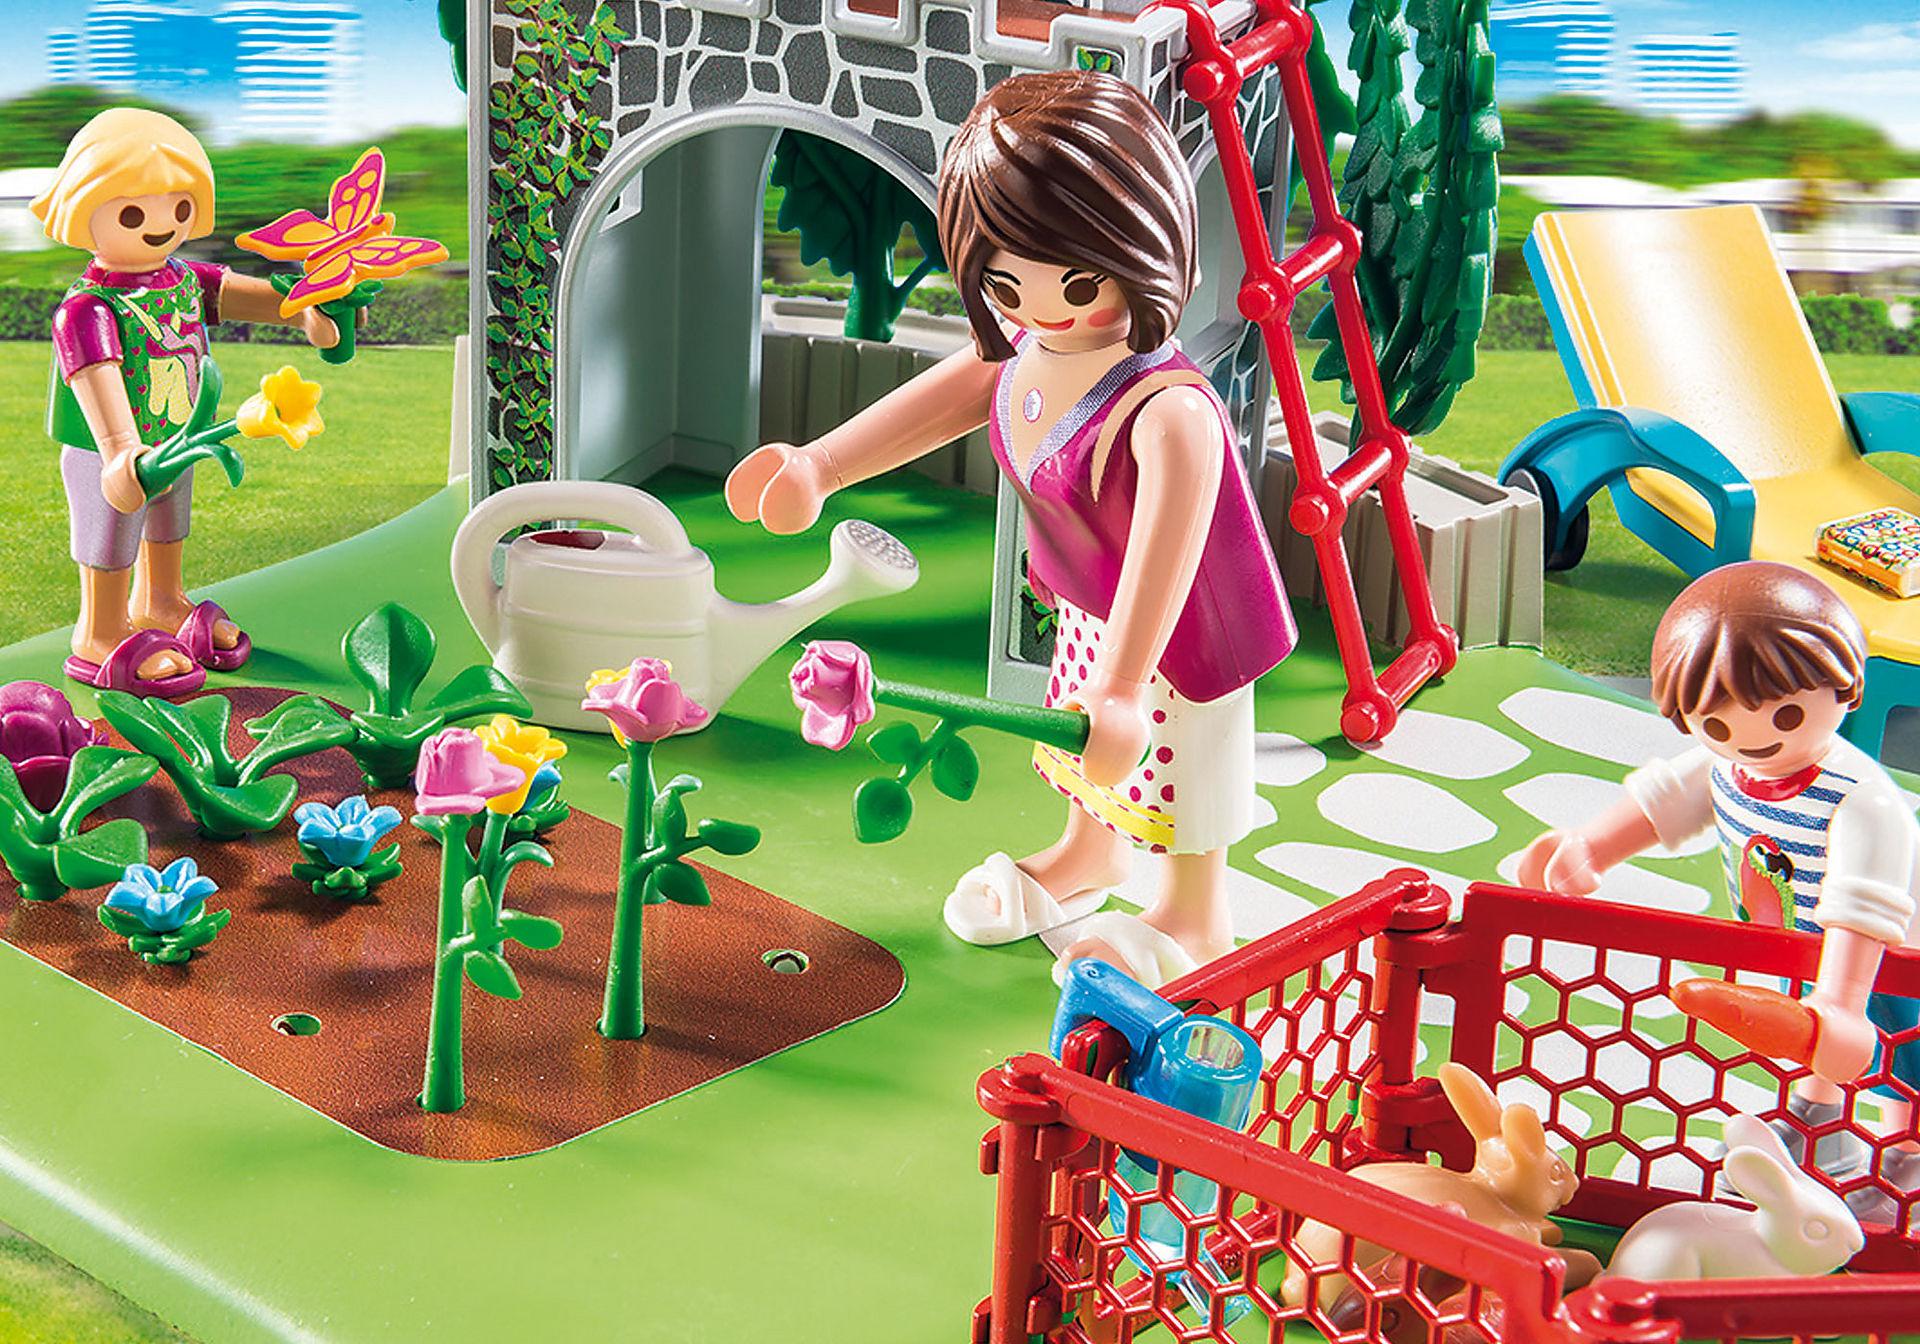 http://media.playmobil.com/i/playmobil/70010_product_extra1/SuperSet Family Garden